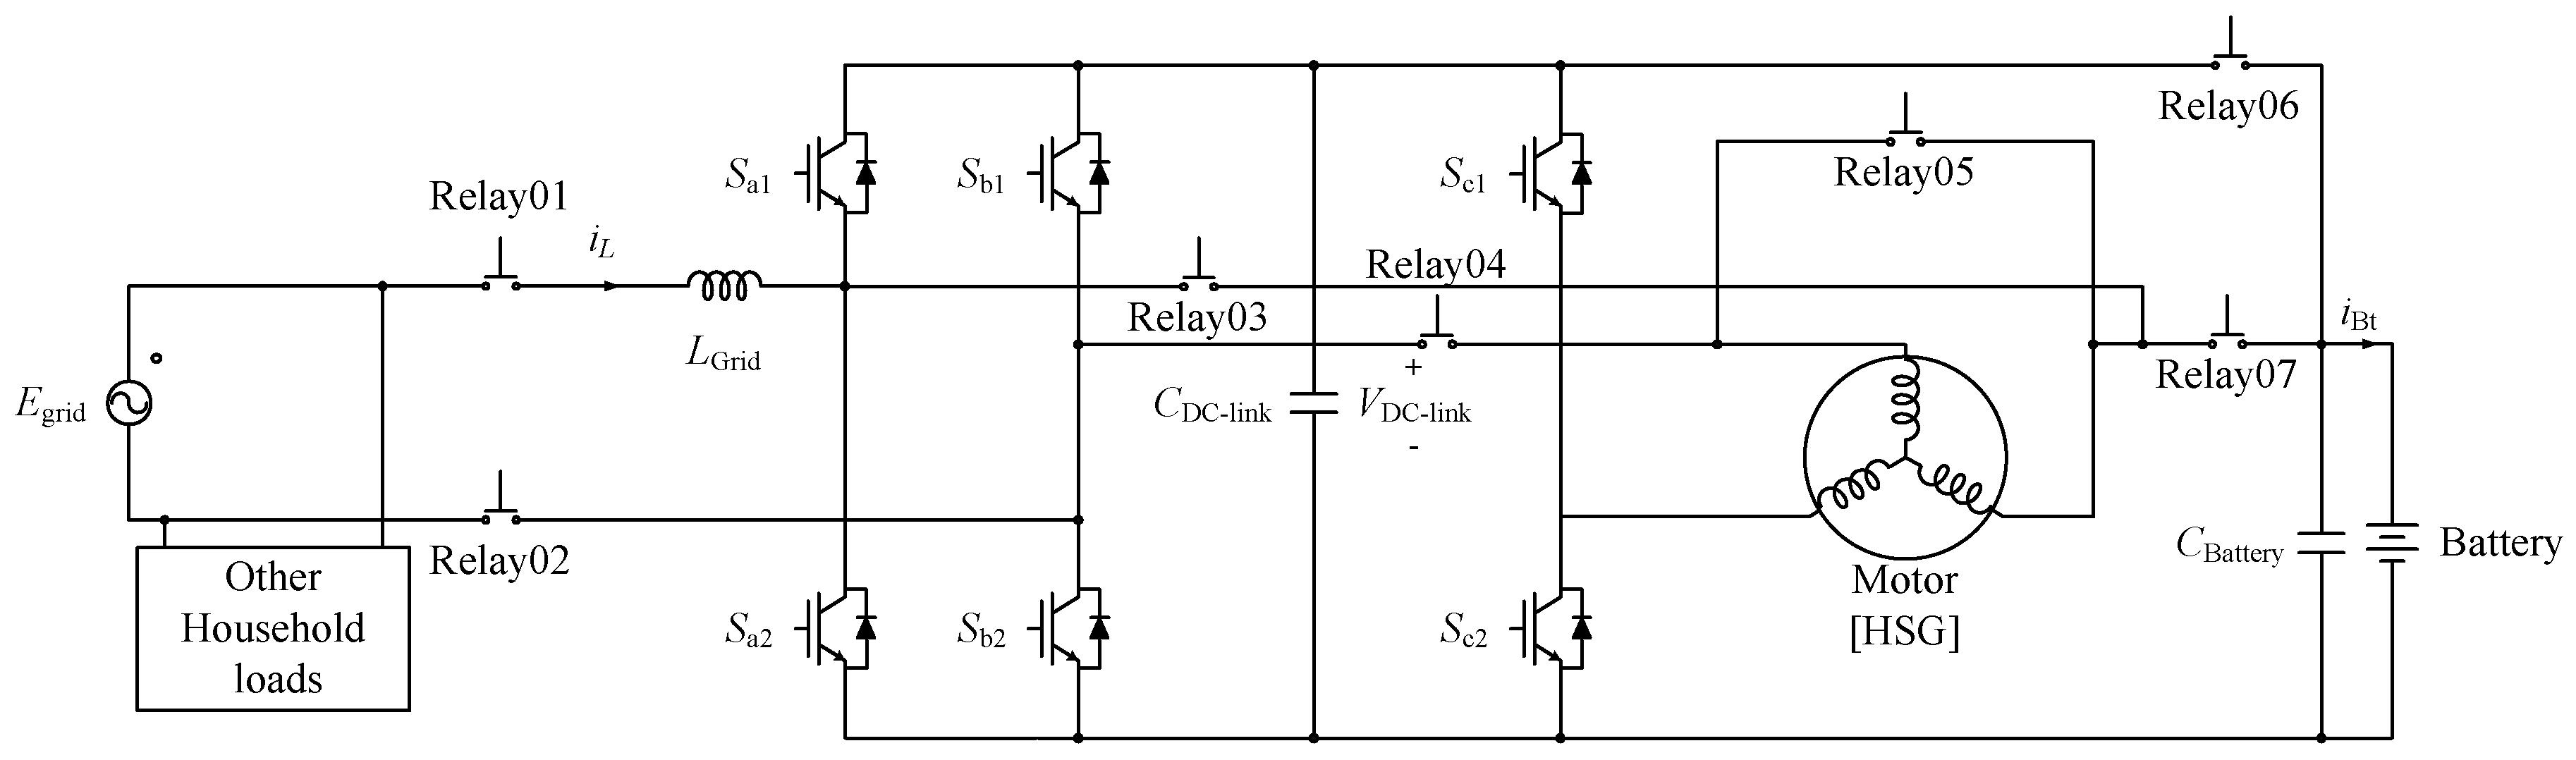 Electronics Free Full Text Single Phase Bidirectional On Board Graphic Equalizer Circuit Diagram Moreover Brushless Motor 07 00287 G001